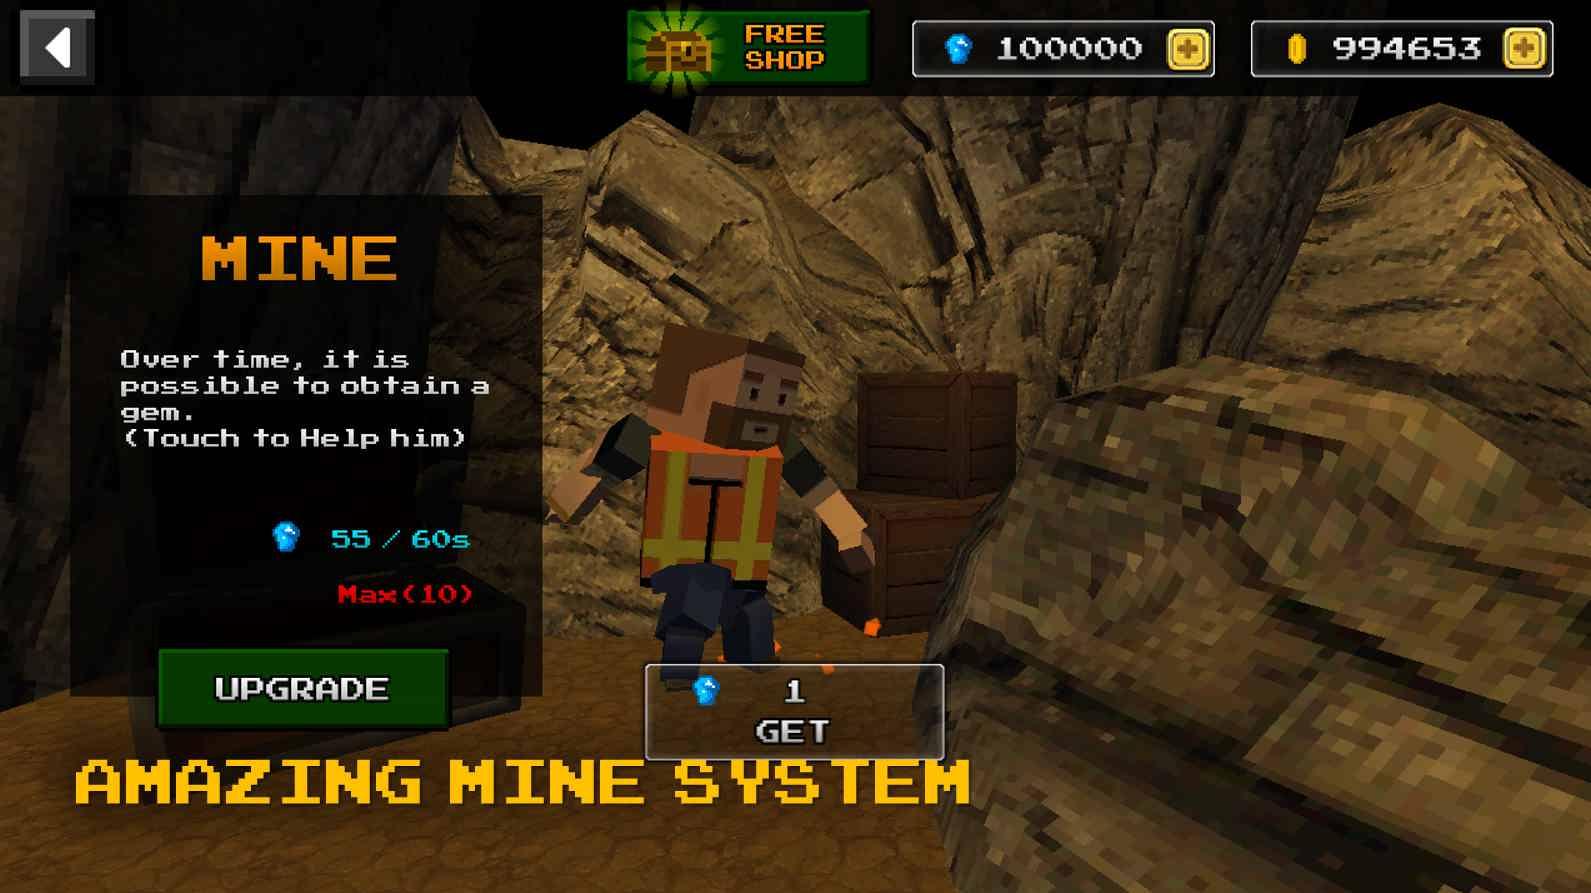 دانلود Pixel Z Gunner 3D – Battle Survival Fps 5.2.1 – بازی تیراندازی پیکسلی اندروید